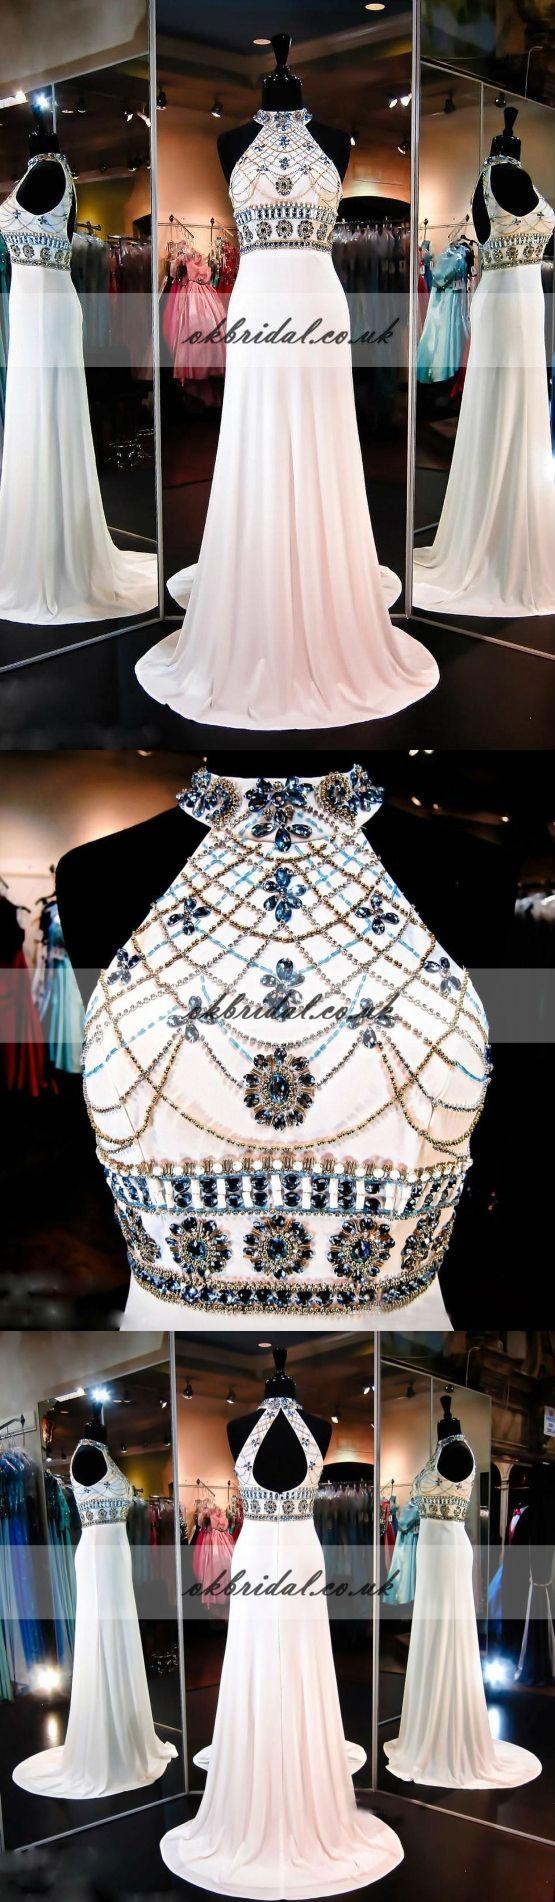 Open-Back Sleeveless Prom Dress, Beaded Sexy Sequin Prom Dress, Mermaid Chiffon Prom Dress, KX194